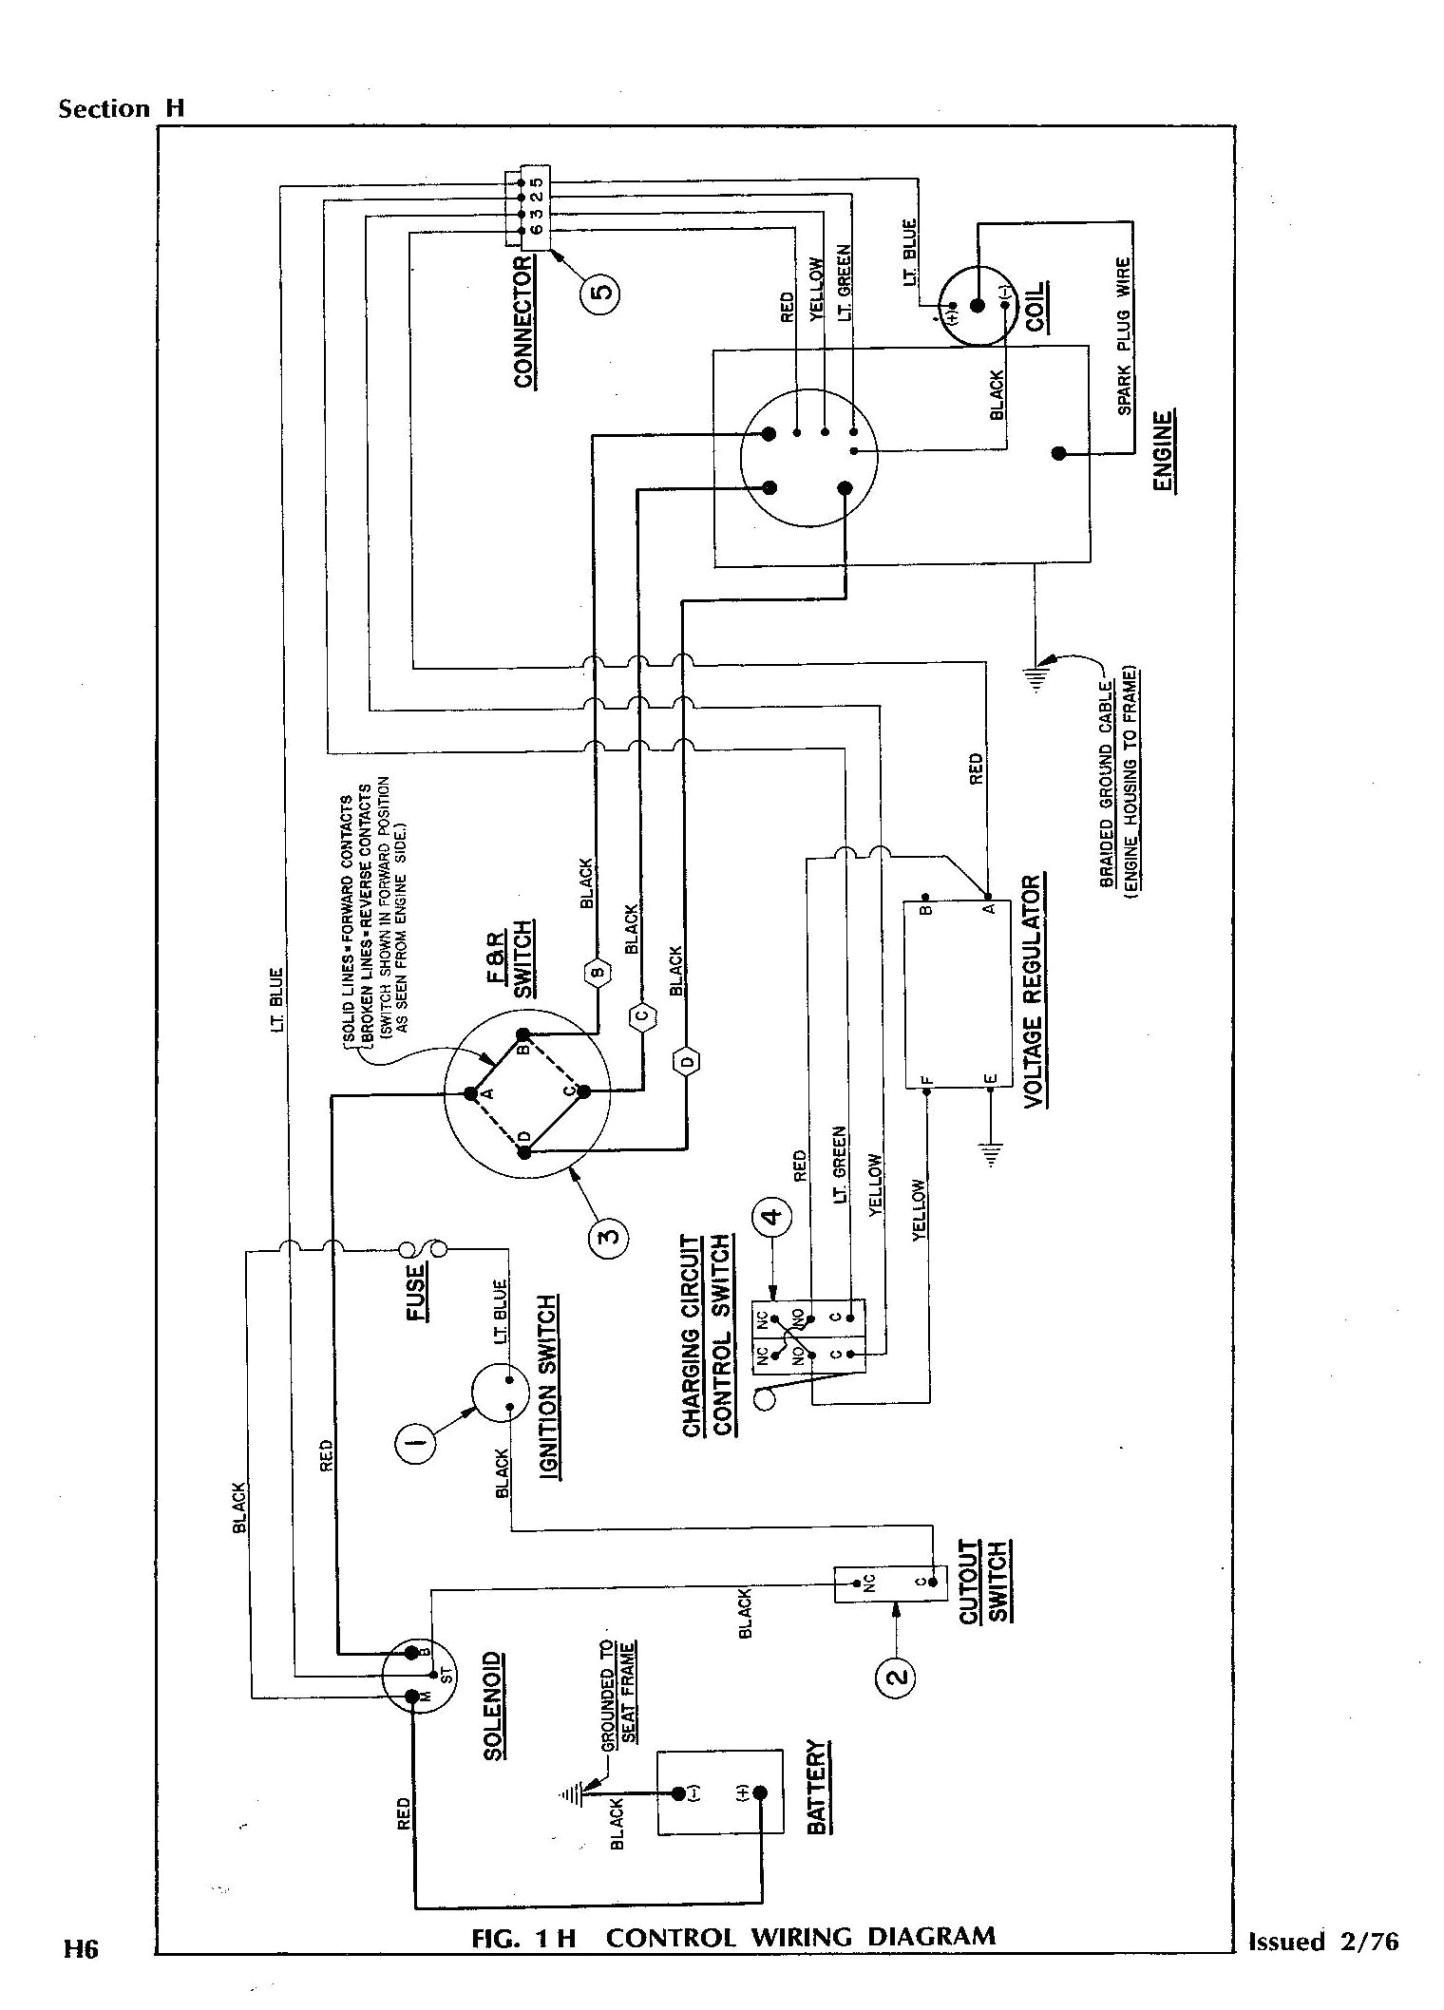 ezgo forward reverse switch wiring diagram